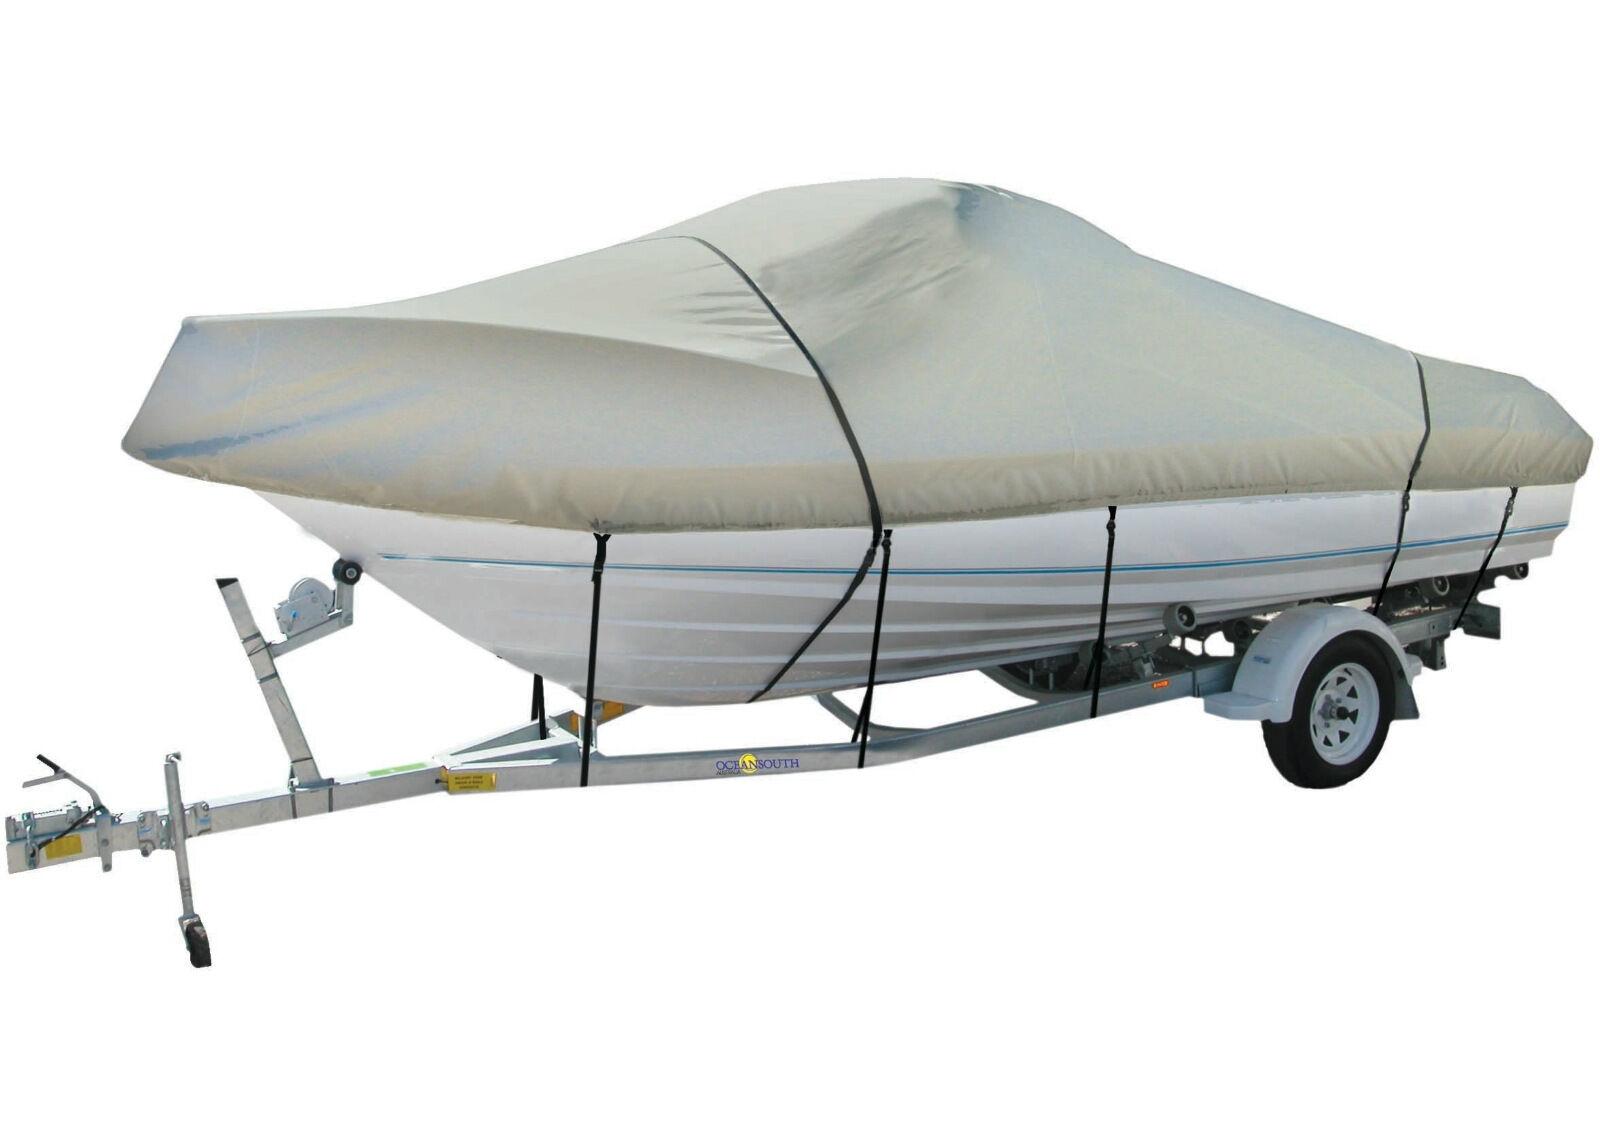 OceanSouth Venepeite Cabin Cruiser tyyppisille veneille 5.9-6.3 m